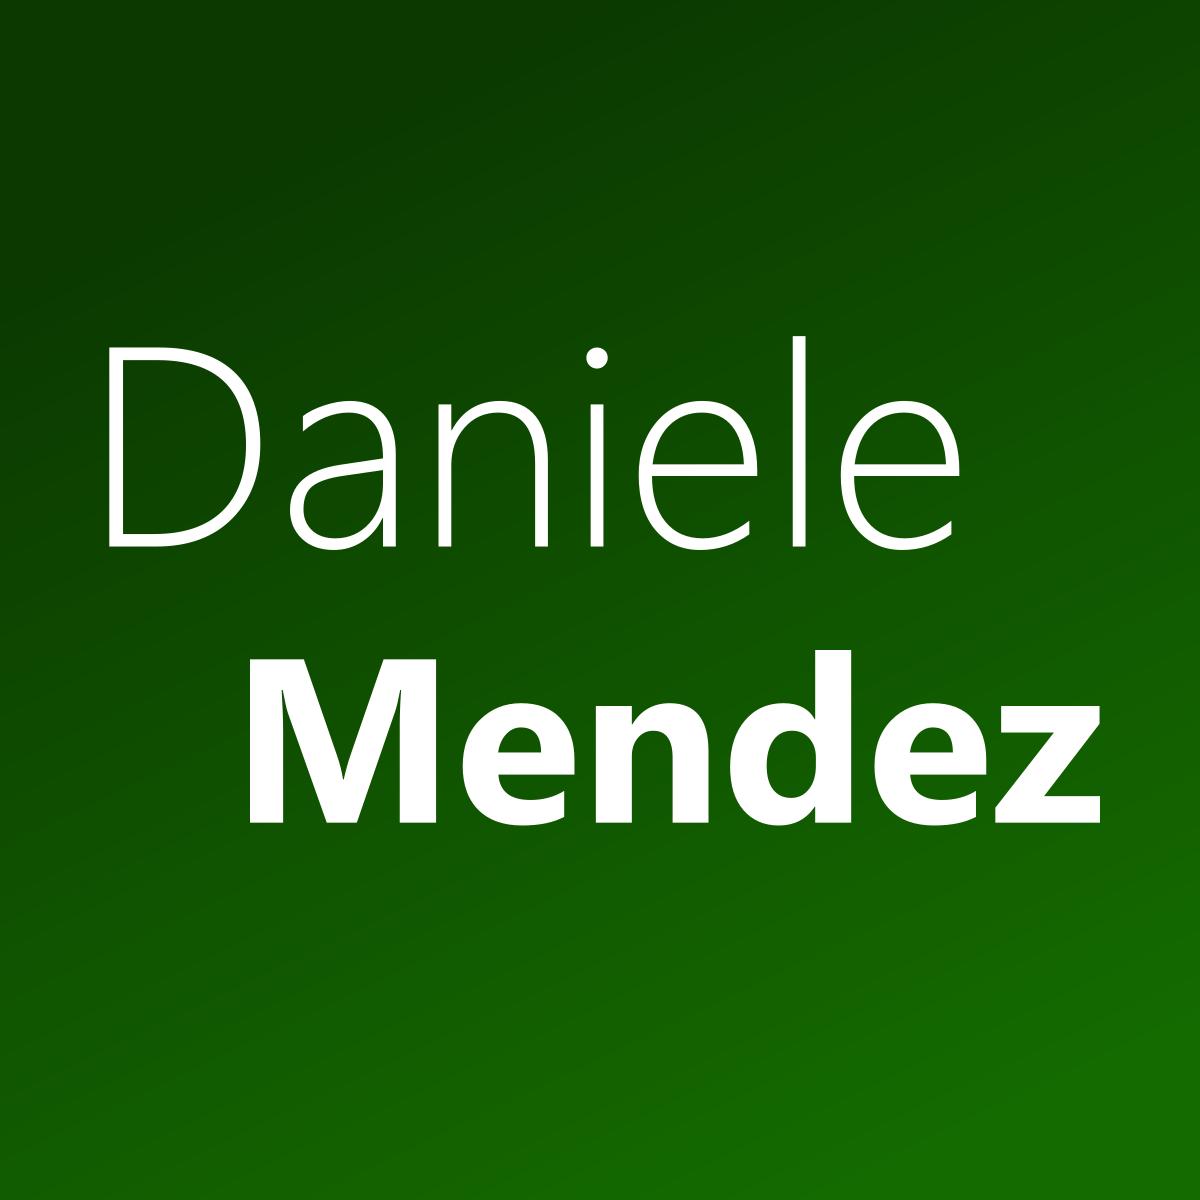 Daniele Mendez